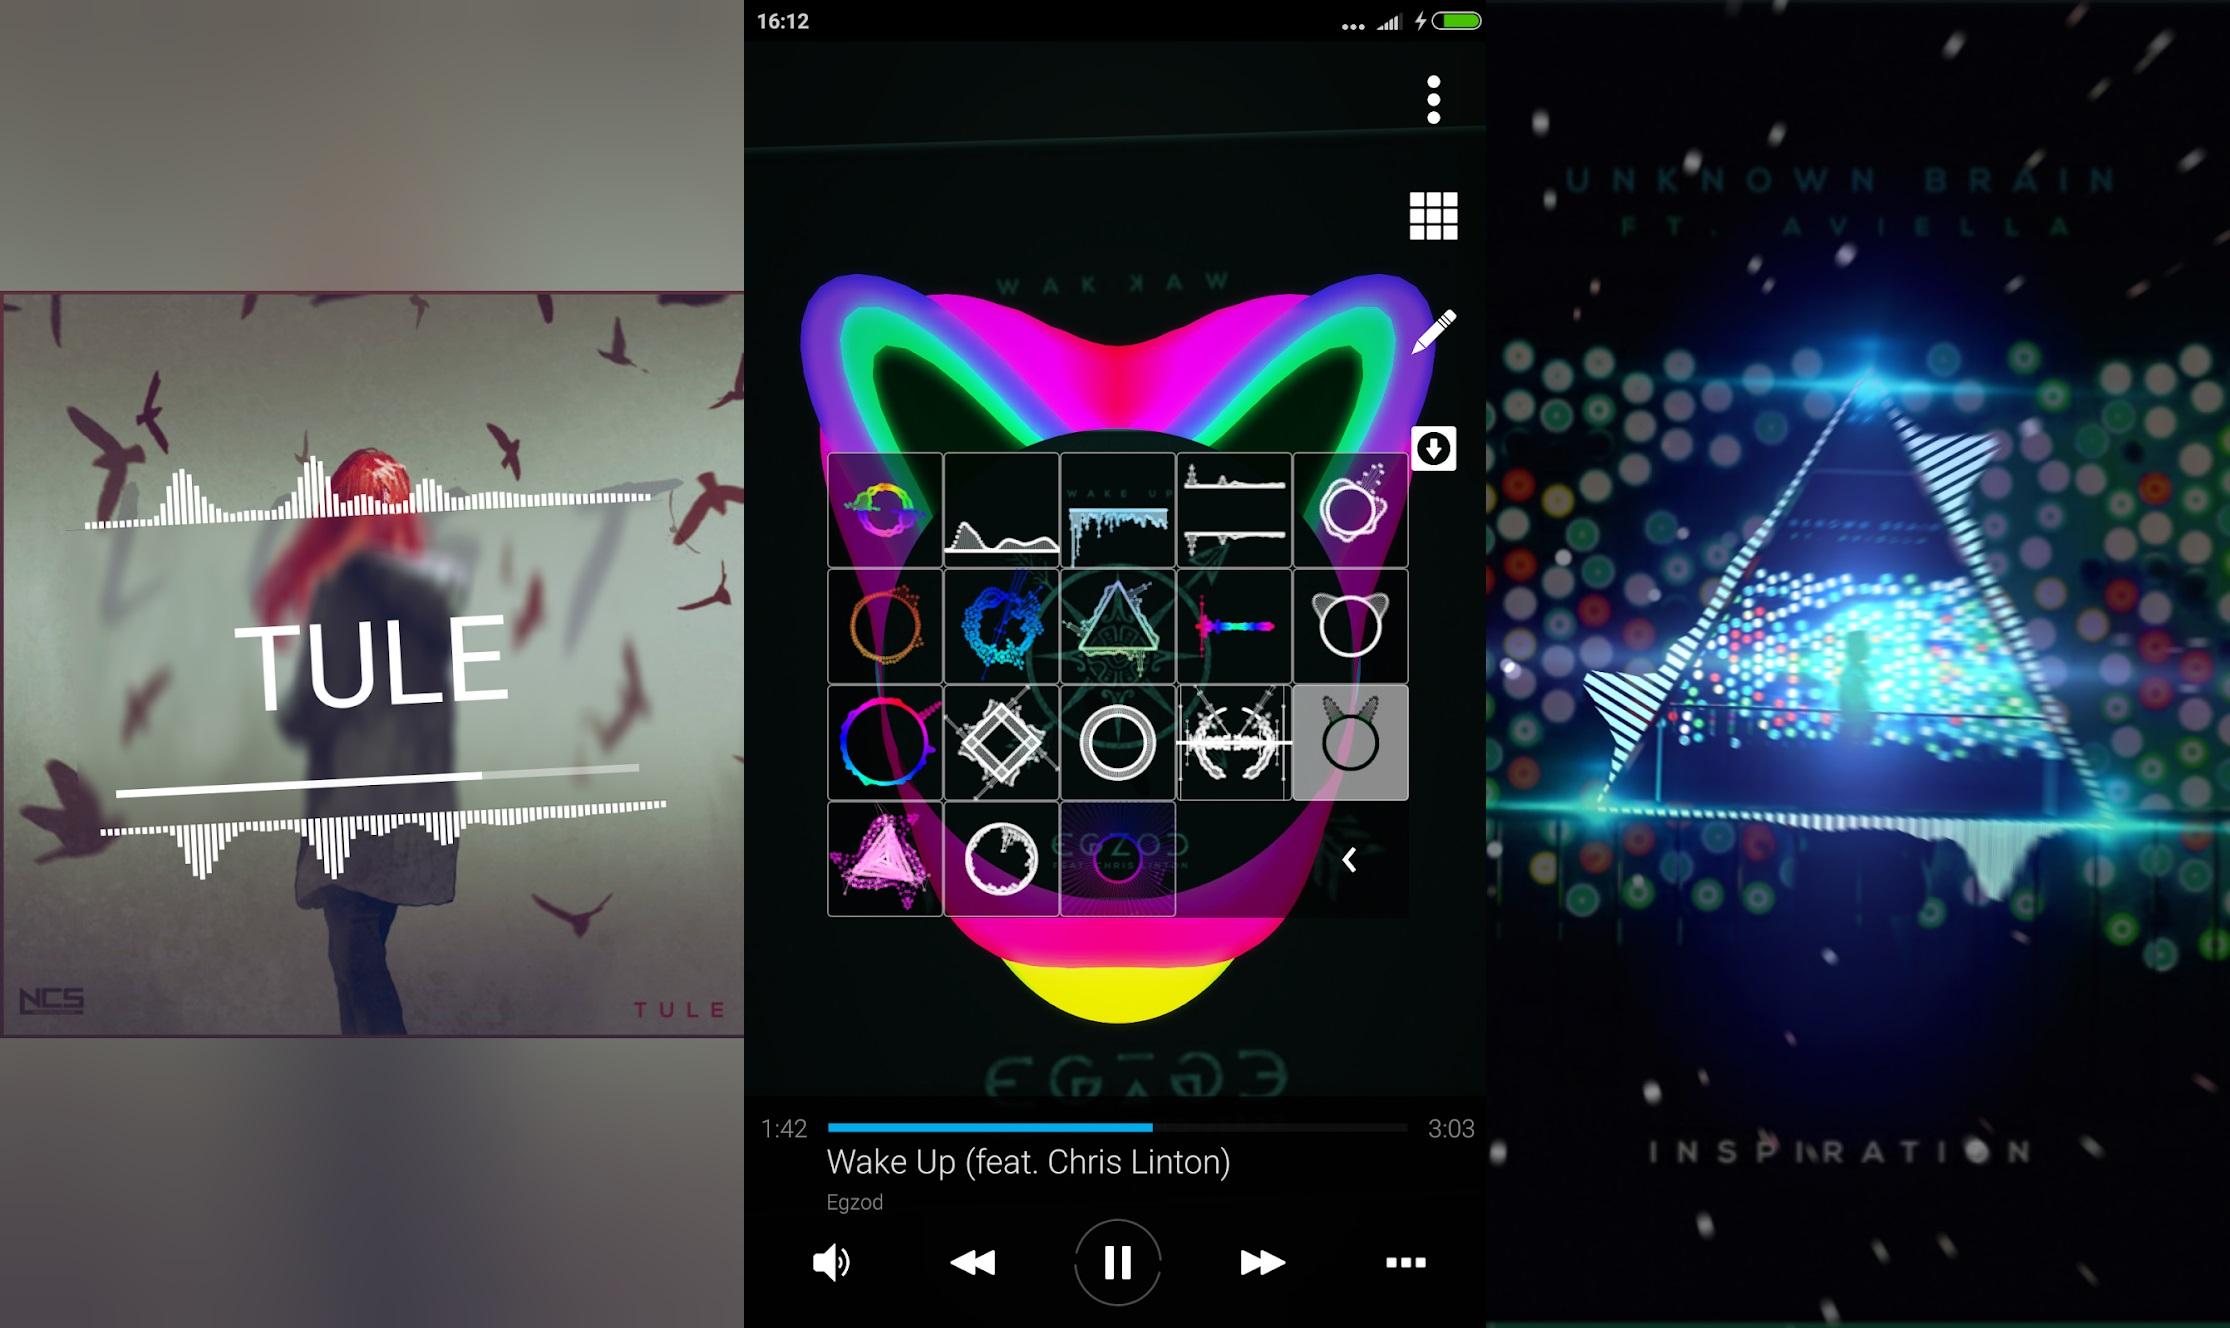 Descarga Mejor Reproductor de Música Android con Avee Player